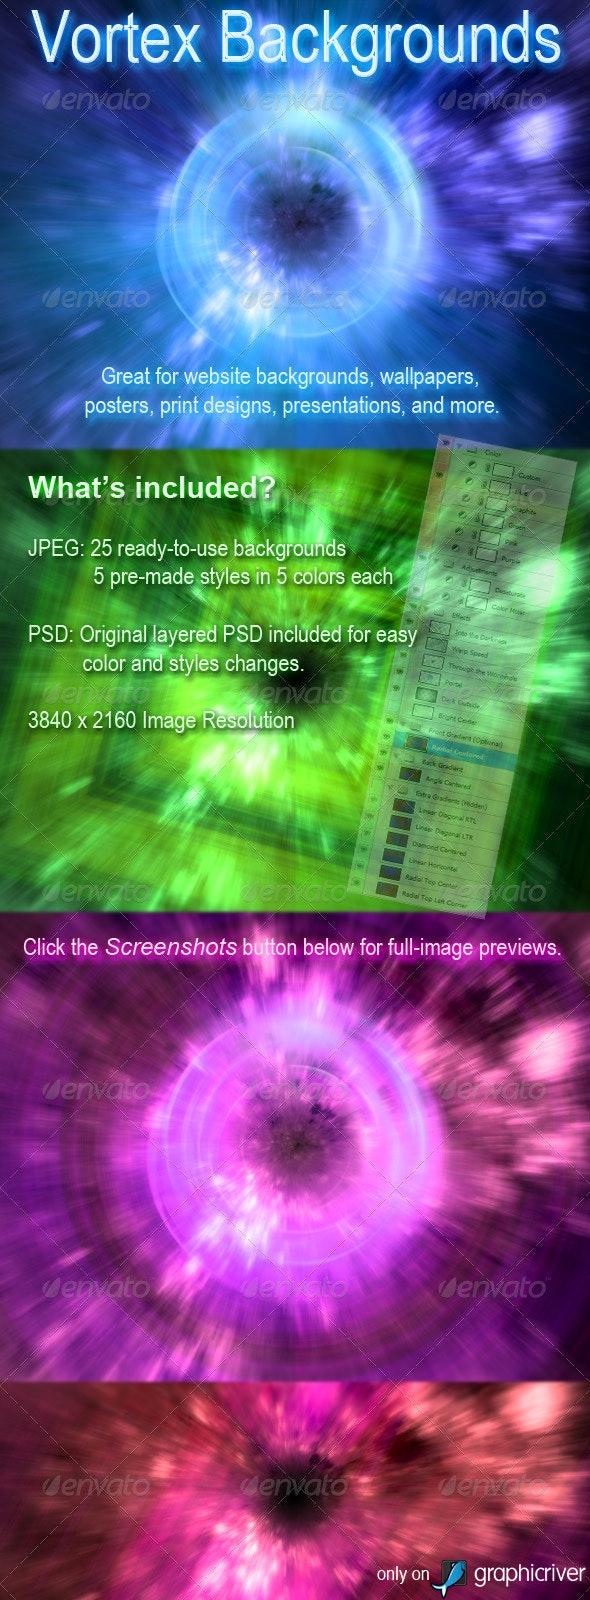 Vortex Backgrounds - Tech / Futuristic Backgrounds